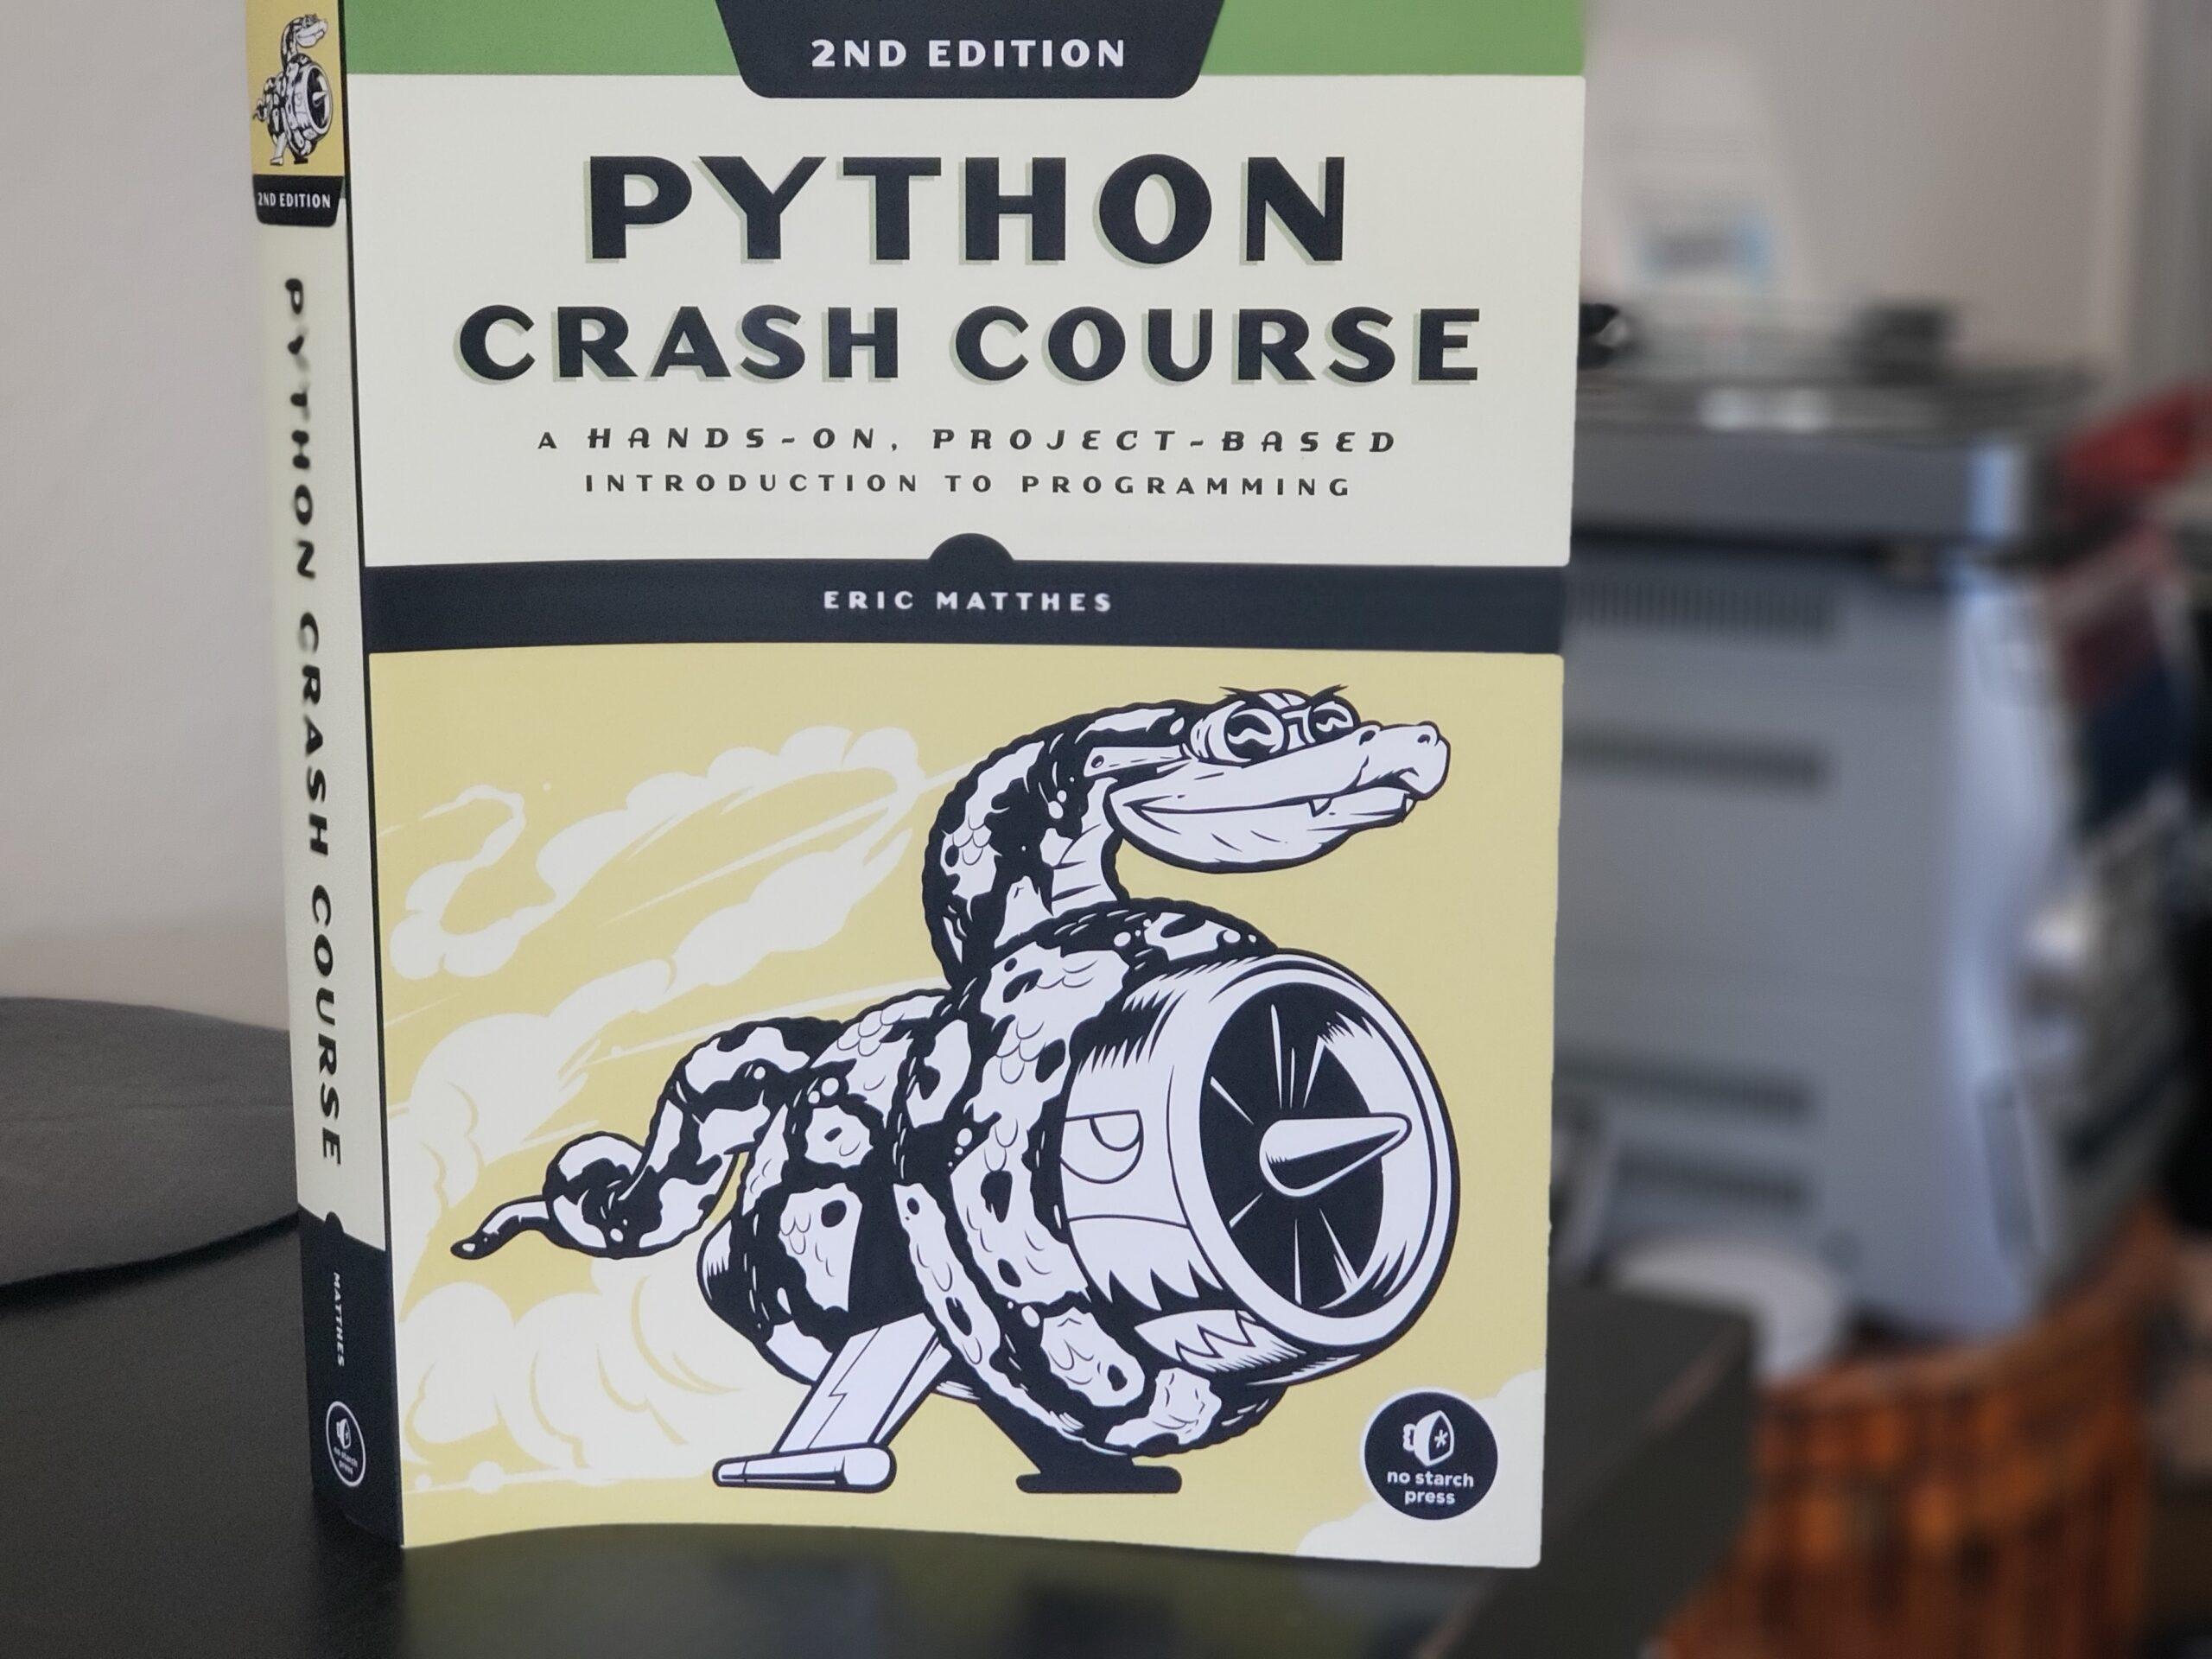 Python Crash Course book cover. Photo by: Matthew McGuire